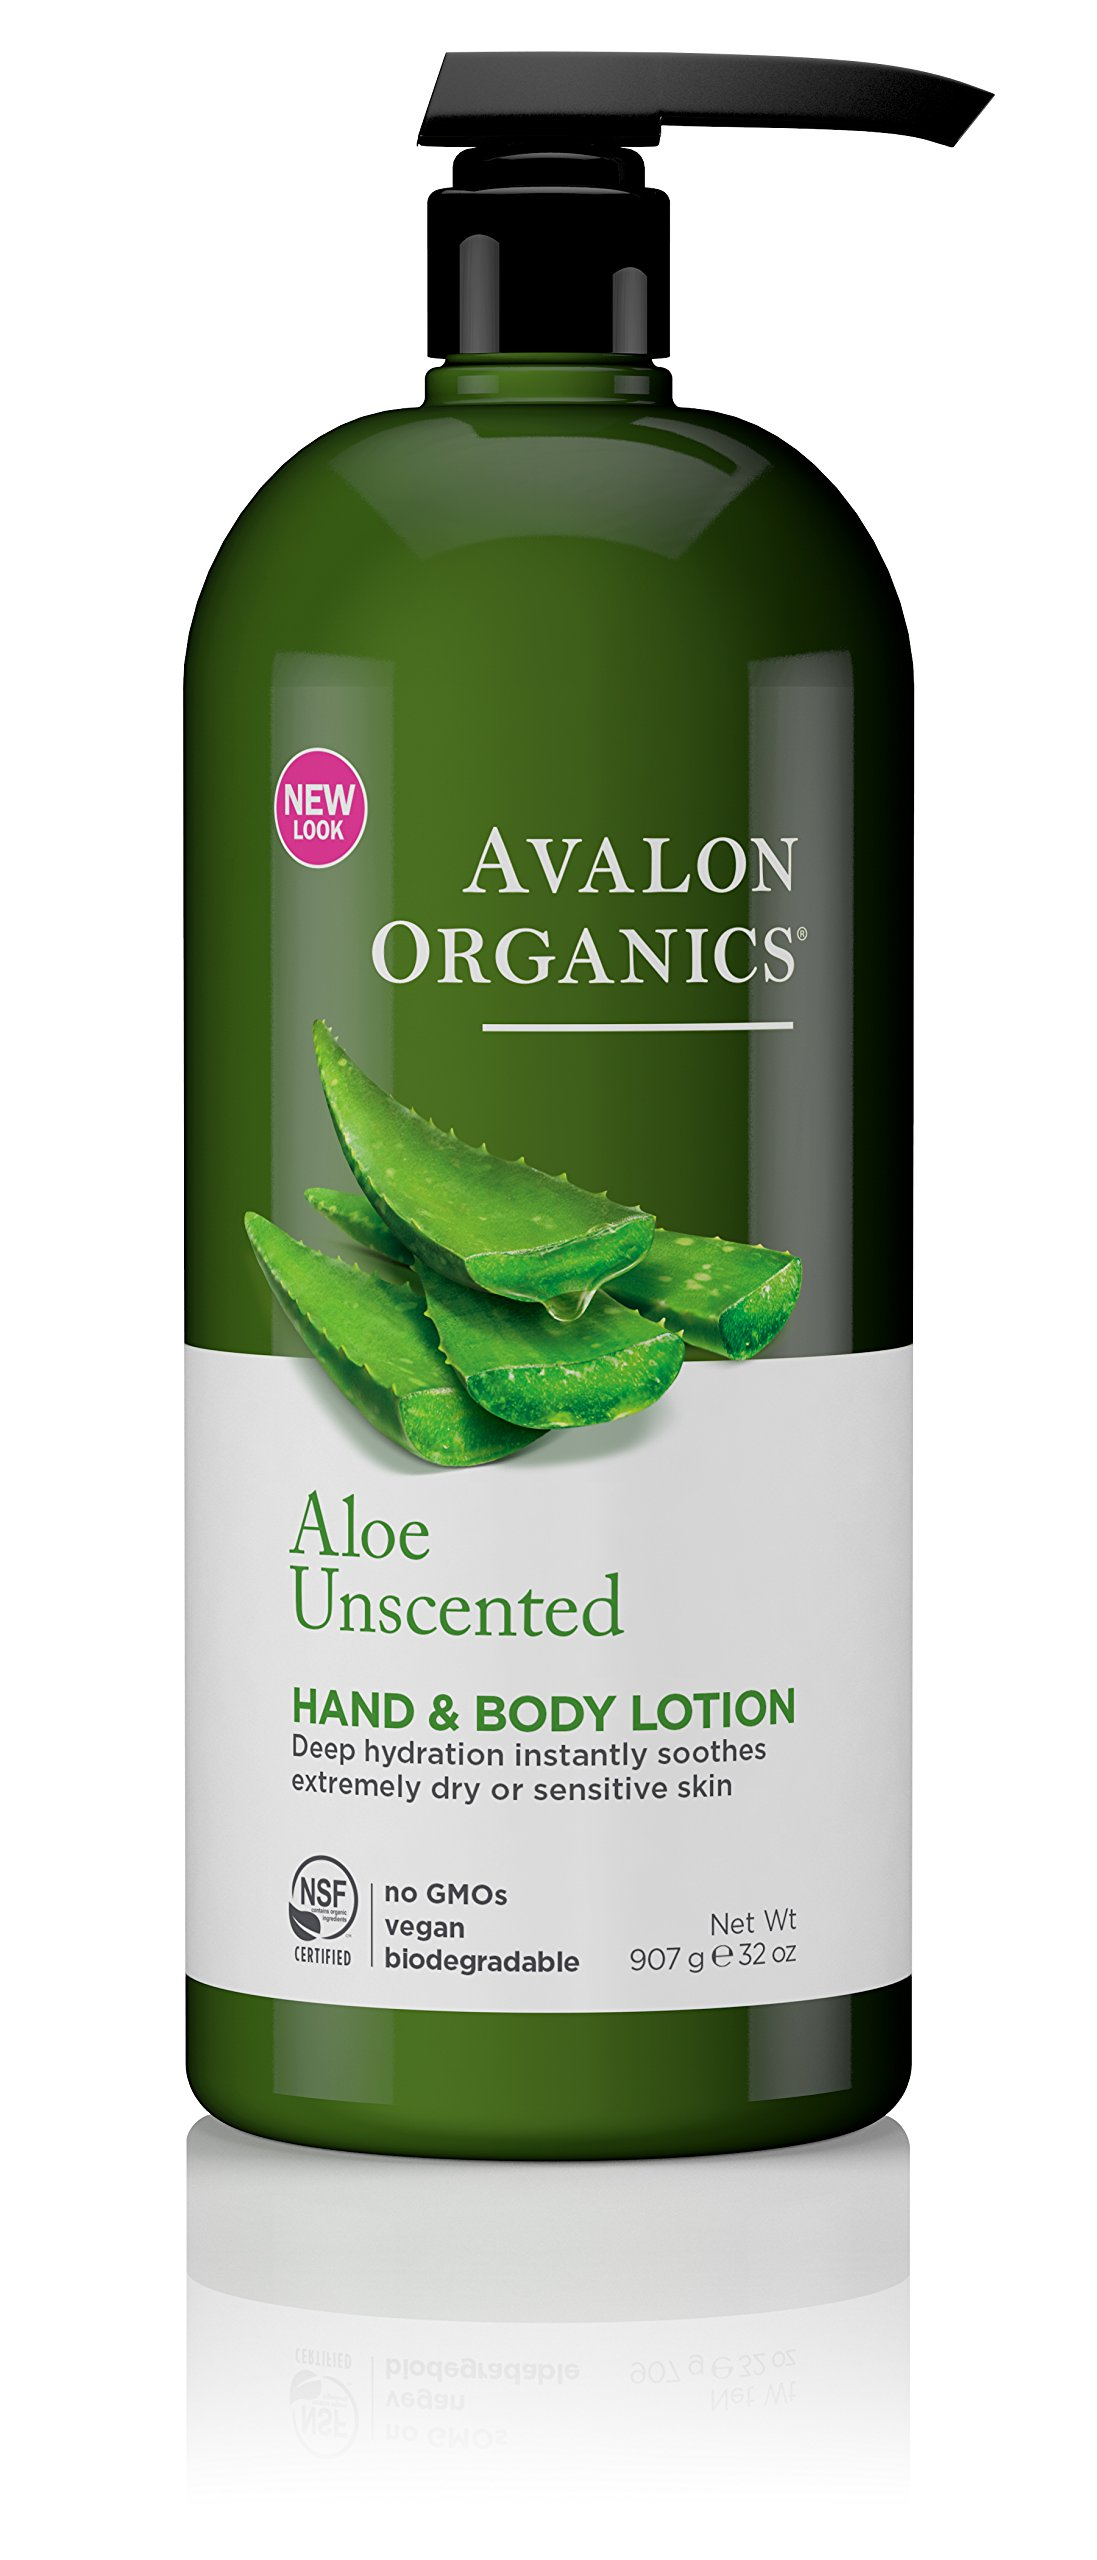 Avalon Organics Hand and Body Lotion, Aloe Unscented - 32 oz by Avalon Organics